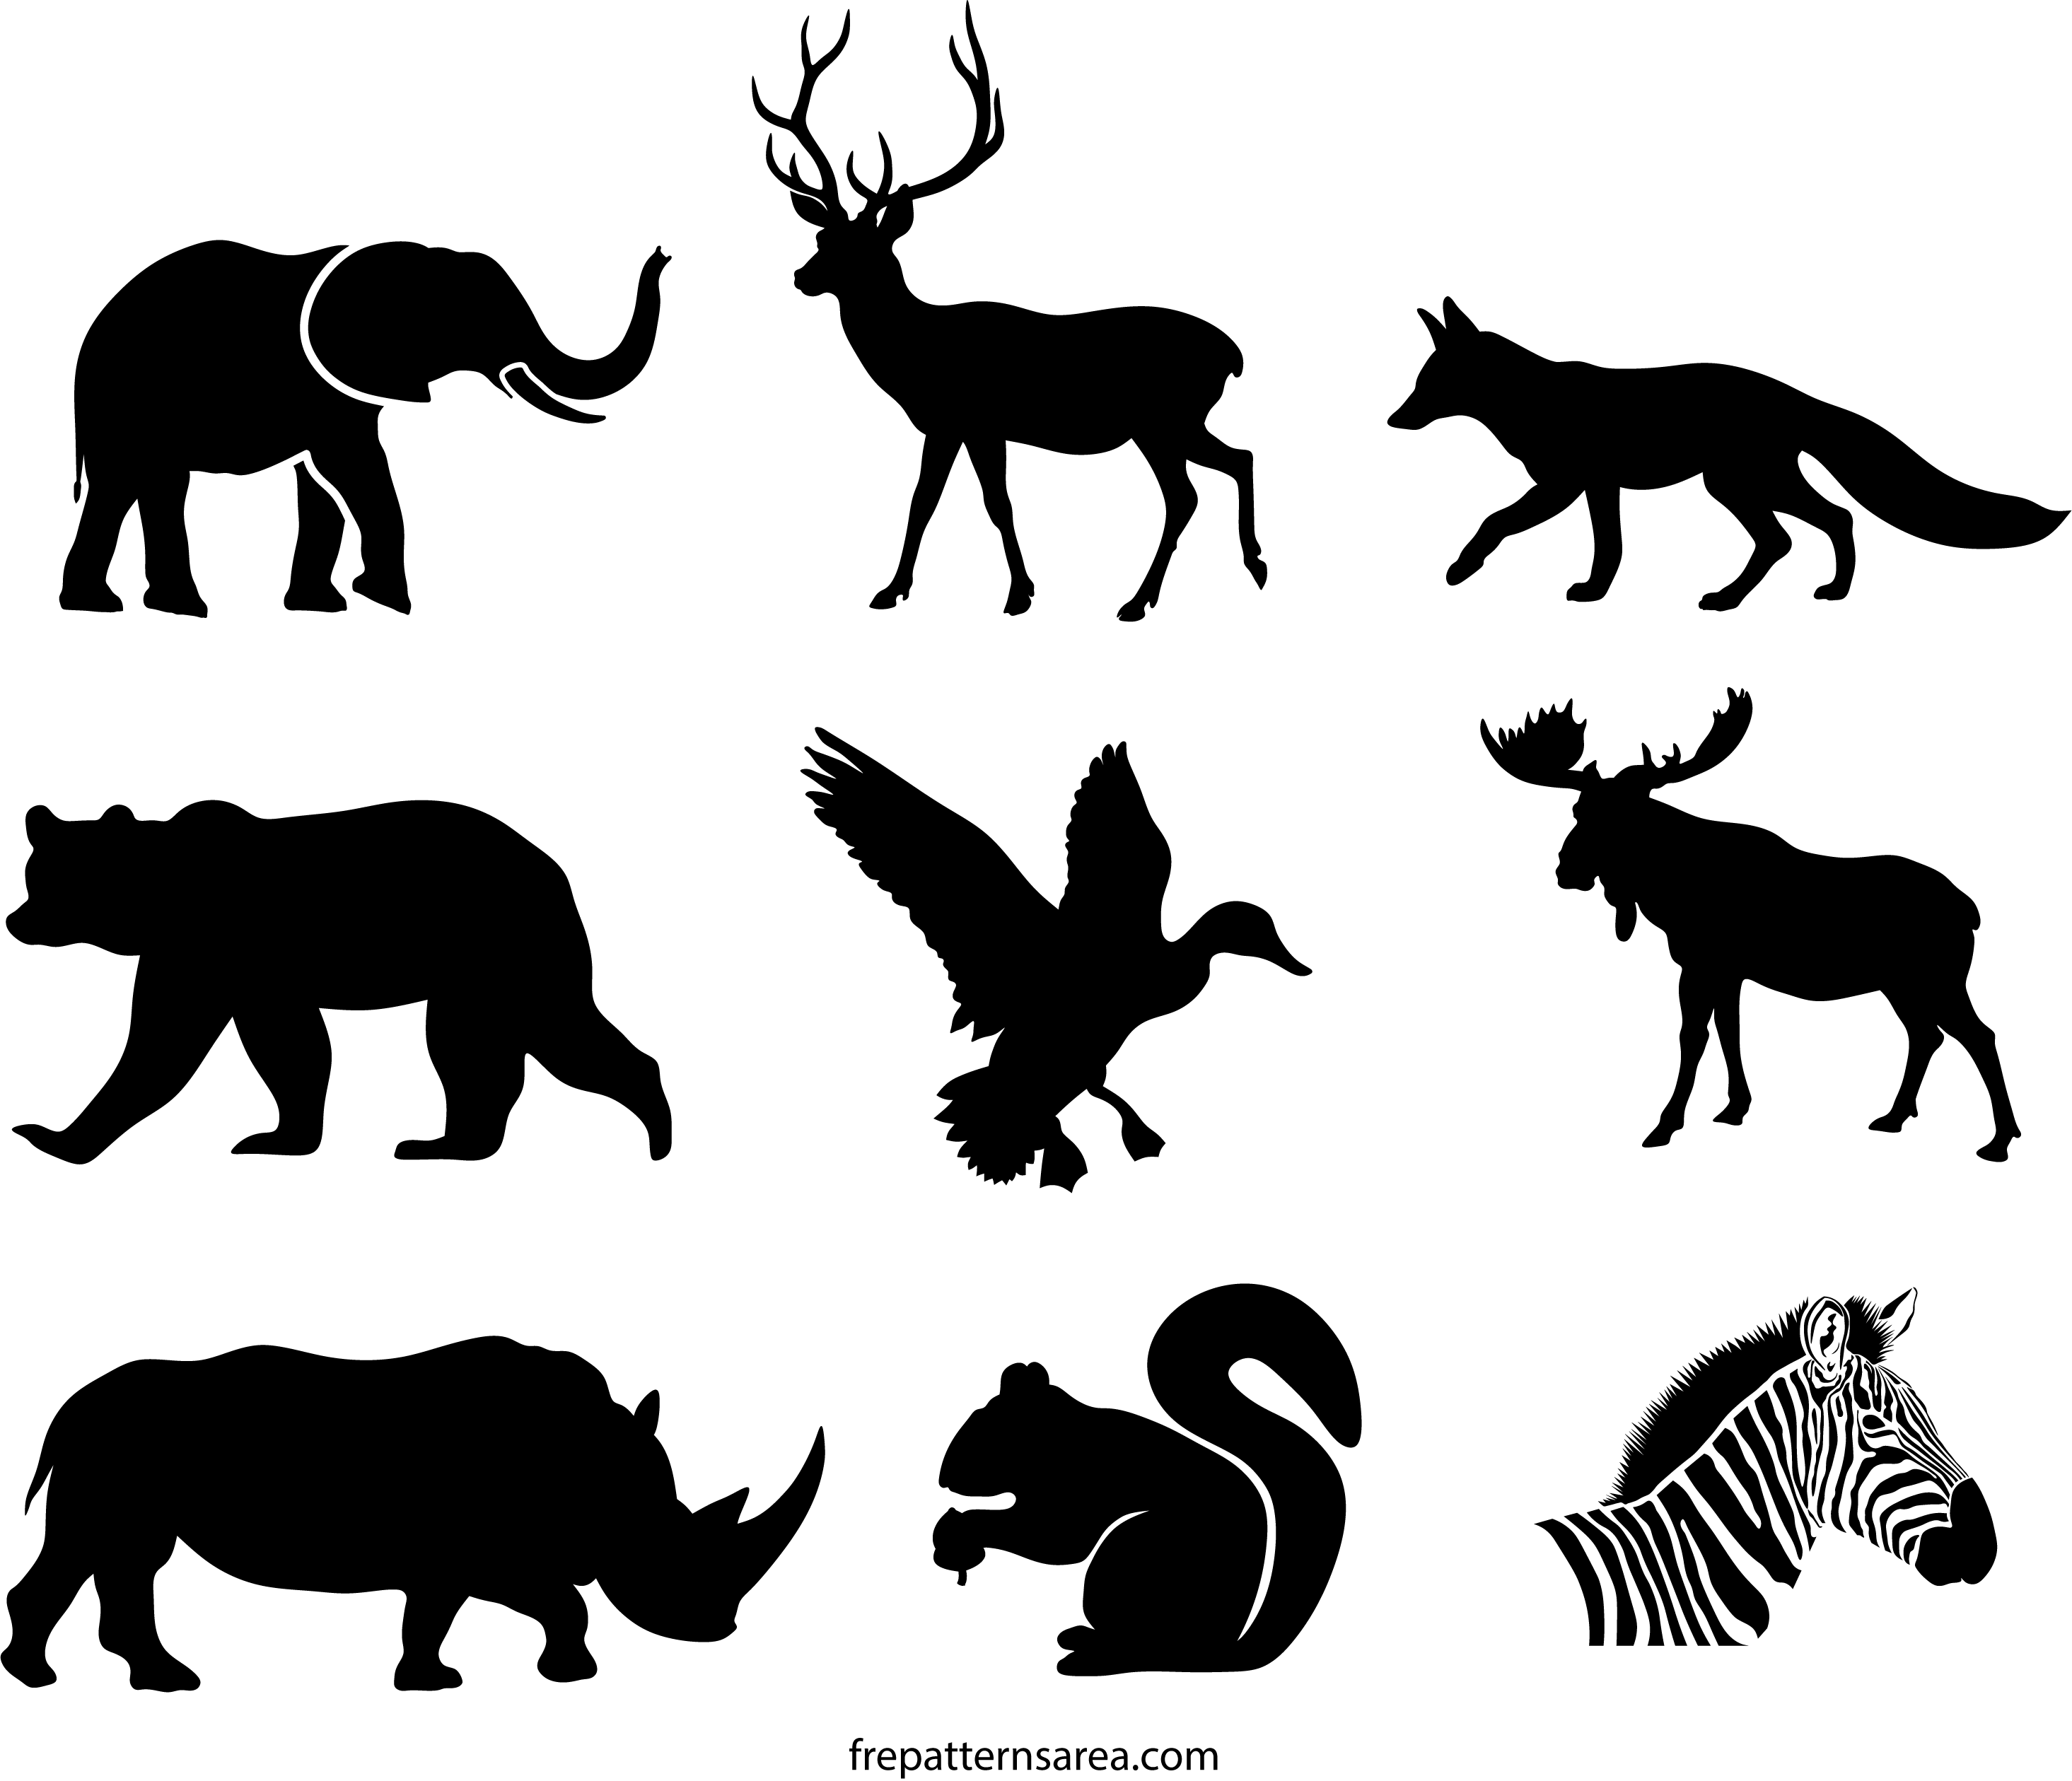 Grenade Vector Stencil Pattern Freepatternsarea